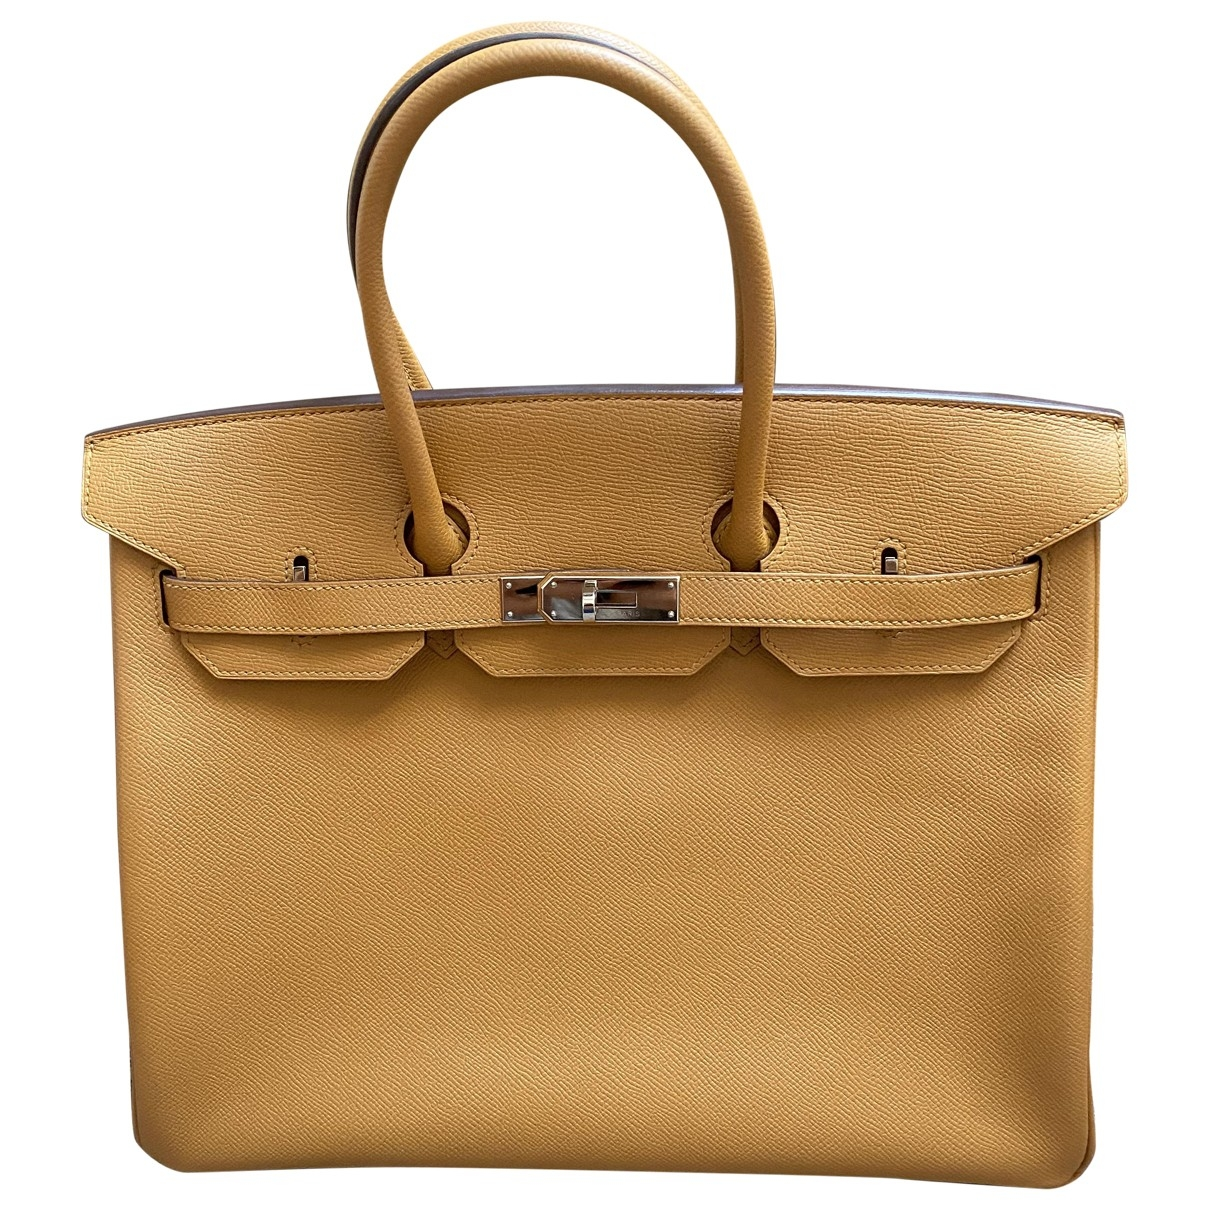 Hermes - Sac a main Birkin 35 pour femme en cuir - camel